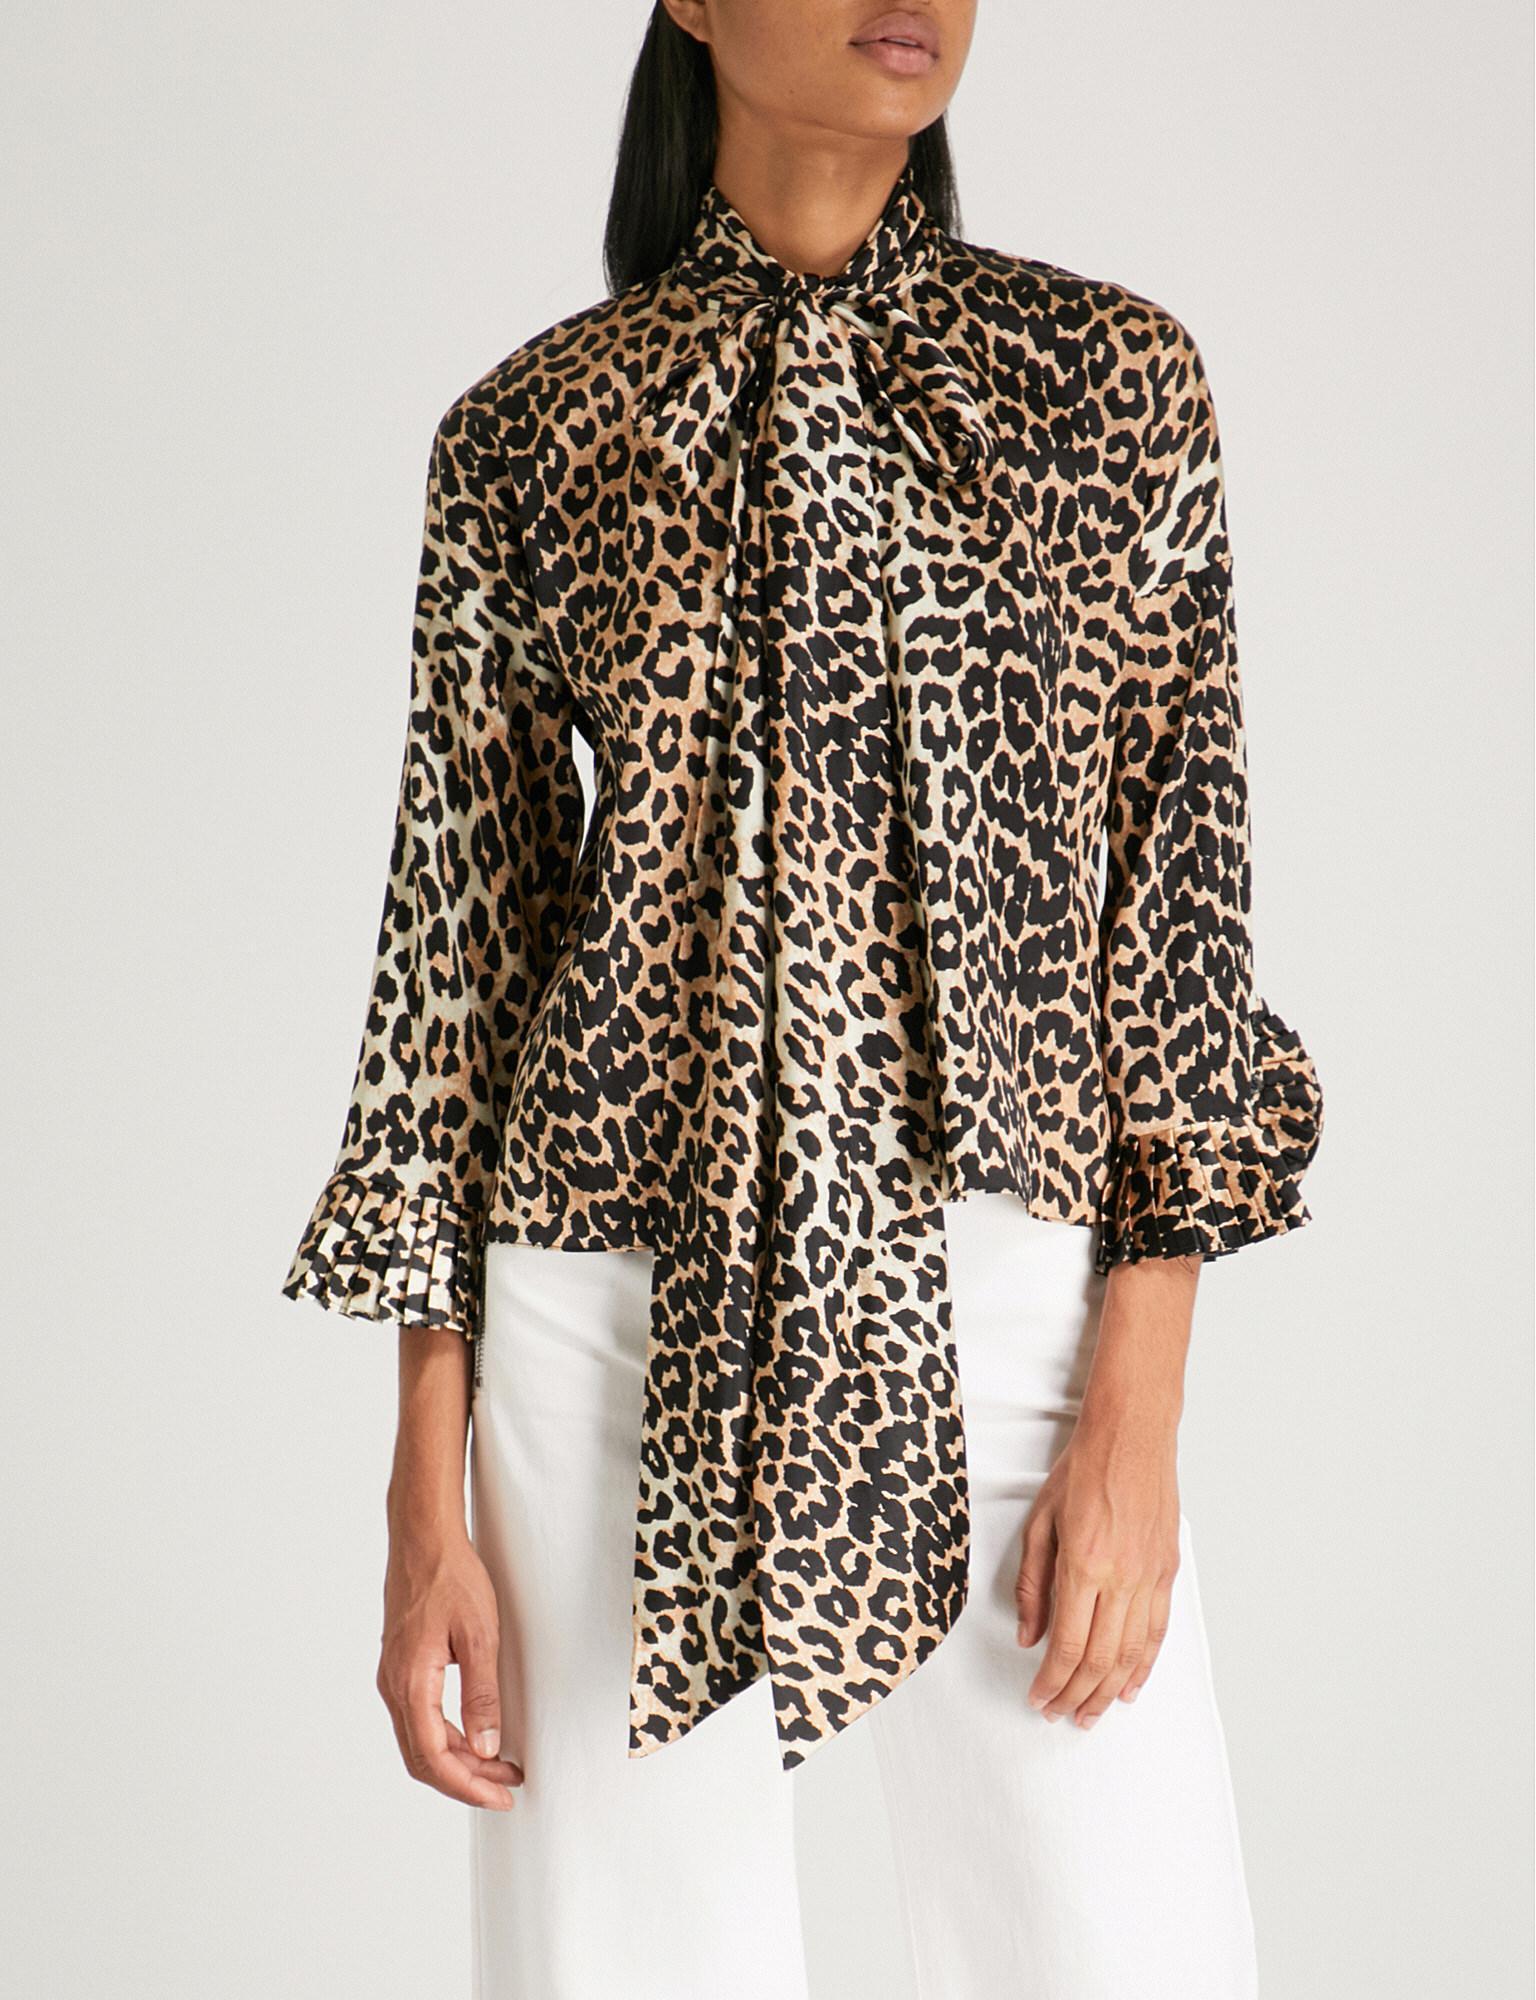 4fd5dfa3cec85b Ganni Black And Brown Calla Stretch-silk Blouse in Black - Save 8 ...